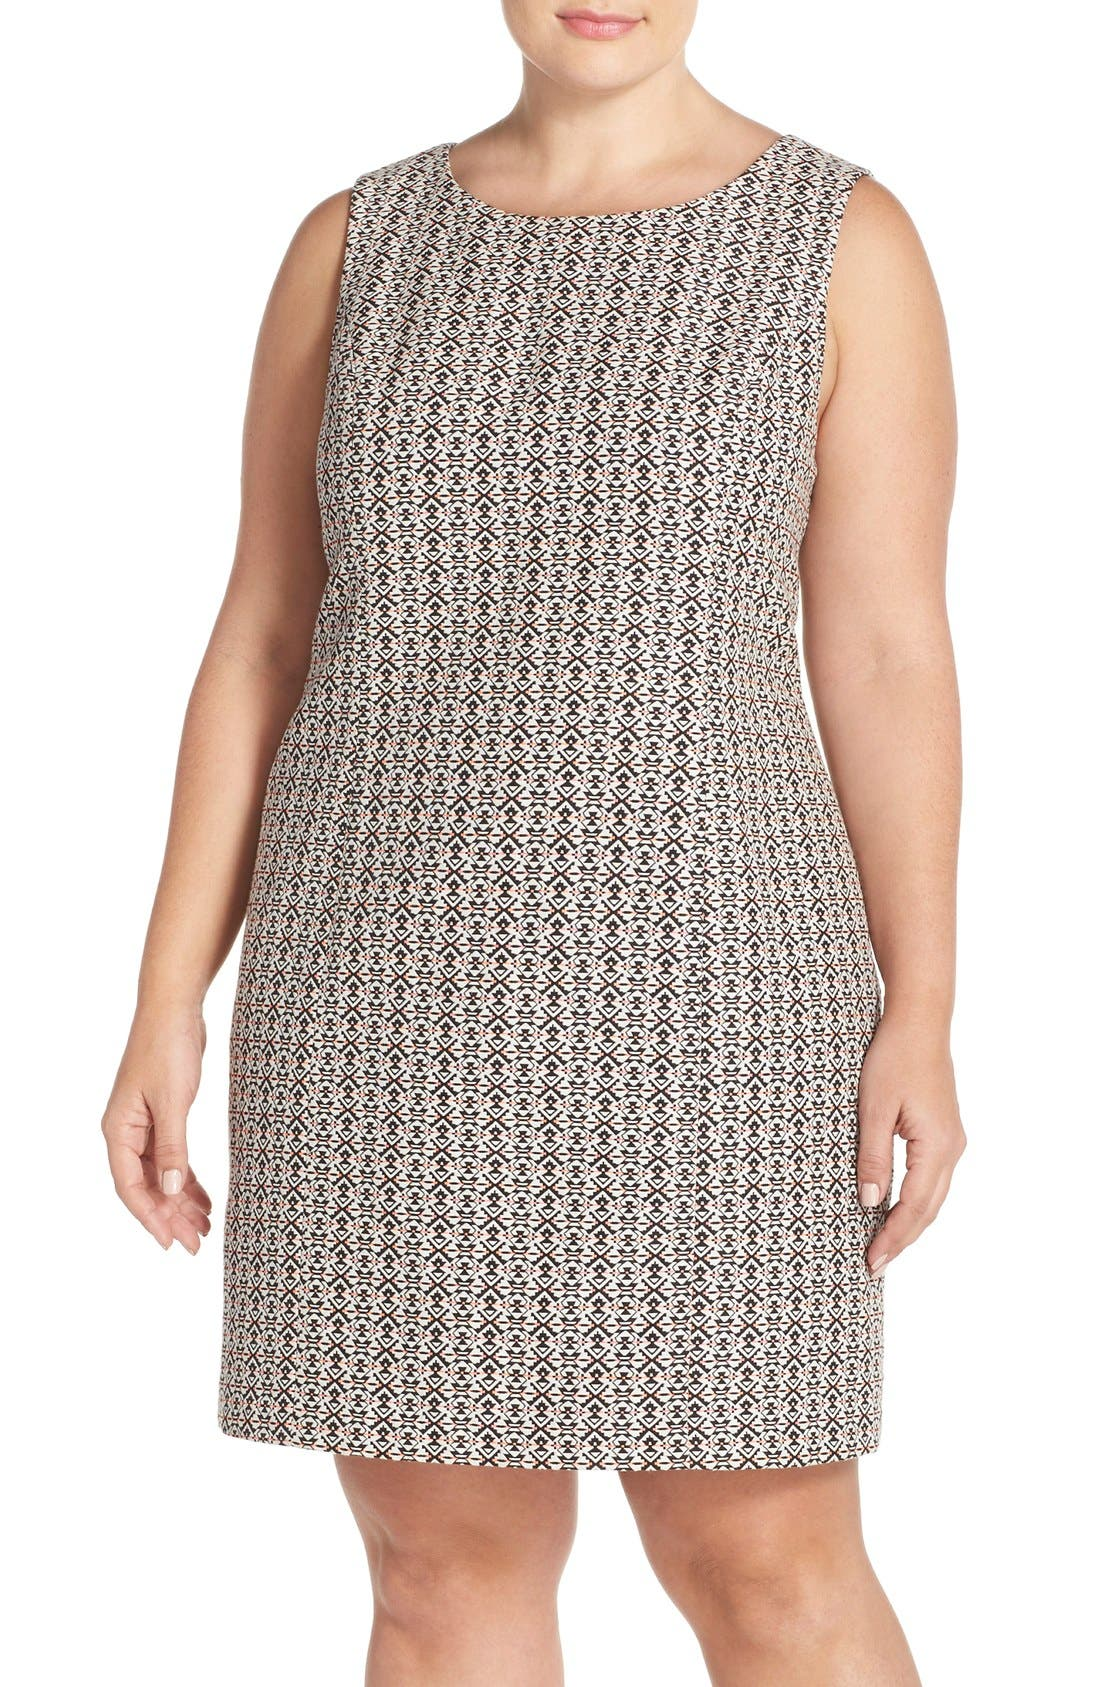 TART 'Dinah' Print Sleeveless Sheath Dress